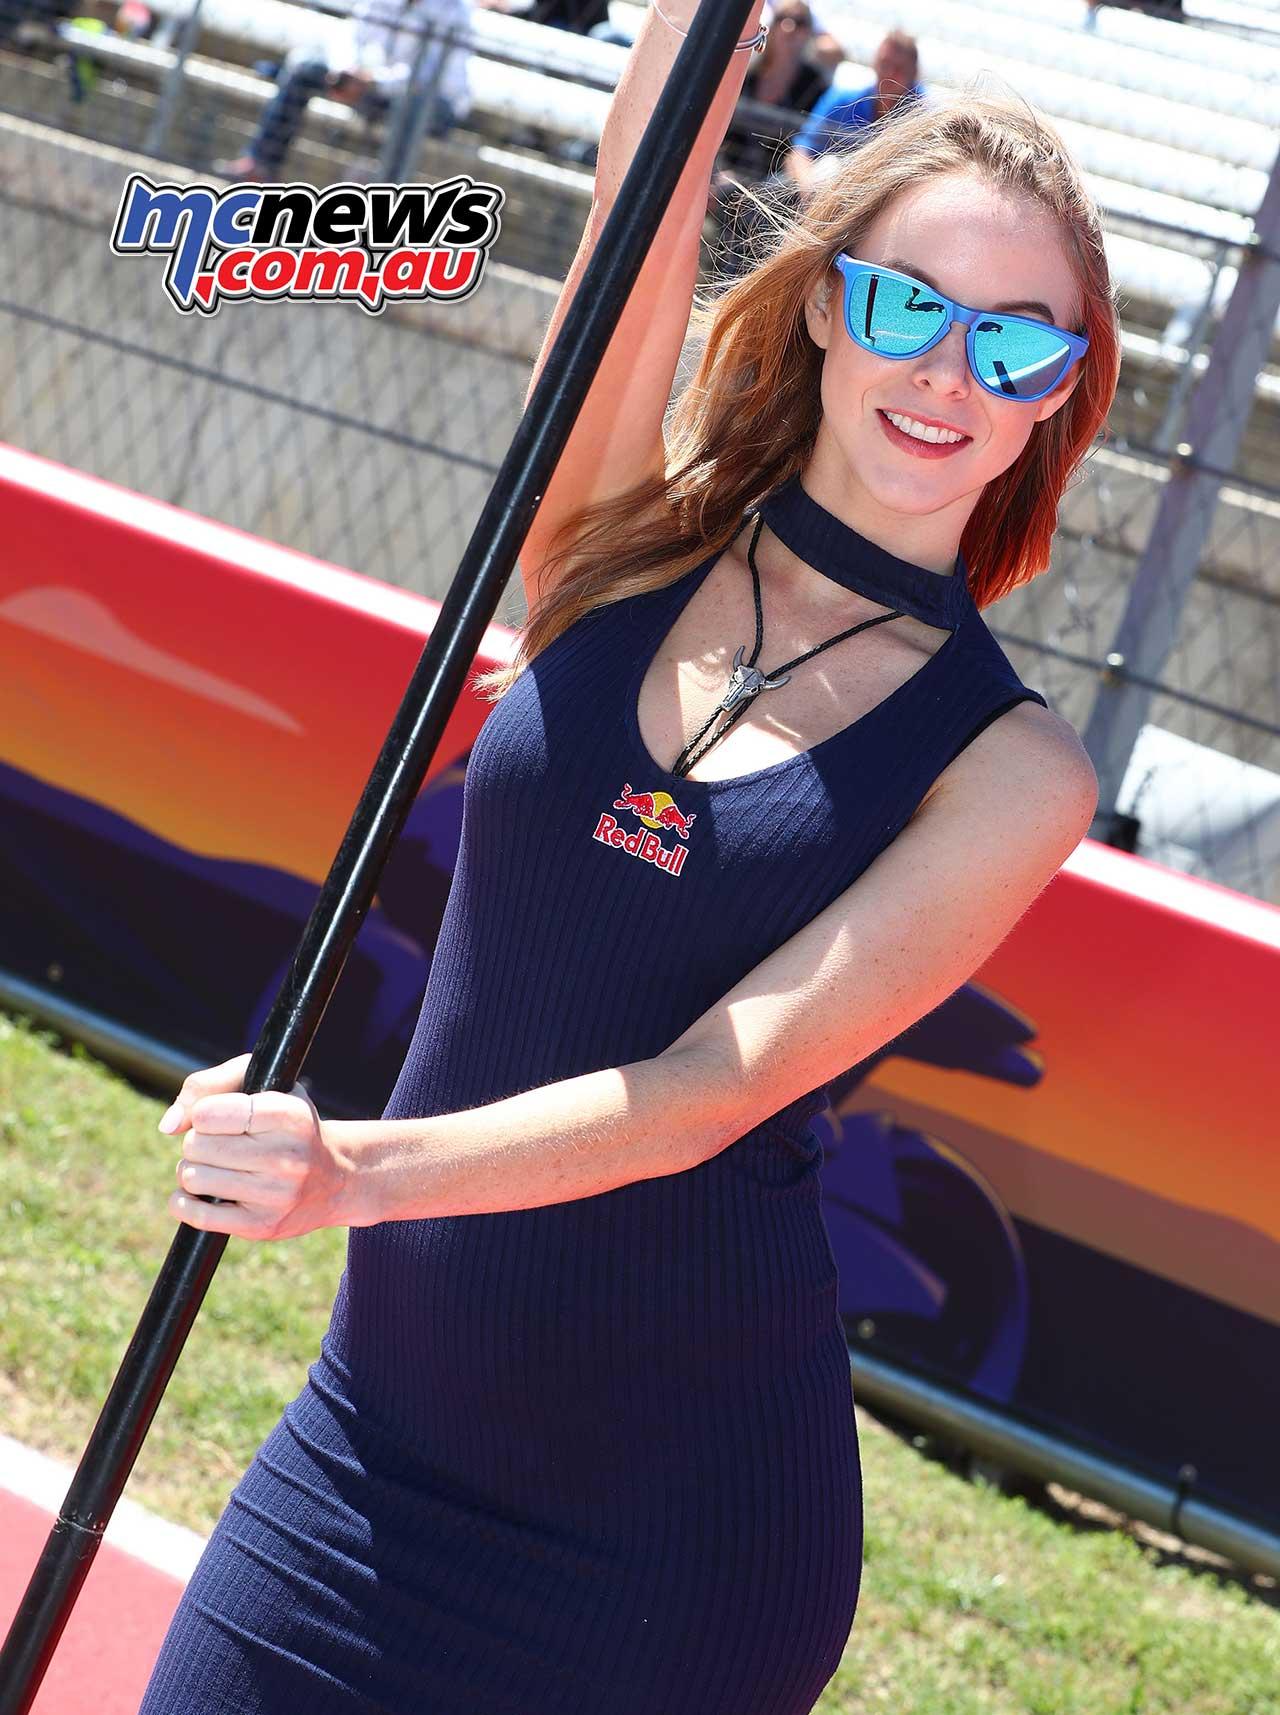 2018 COTA MotoGP Images | Grid Girls | MCNews.com.au